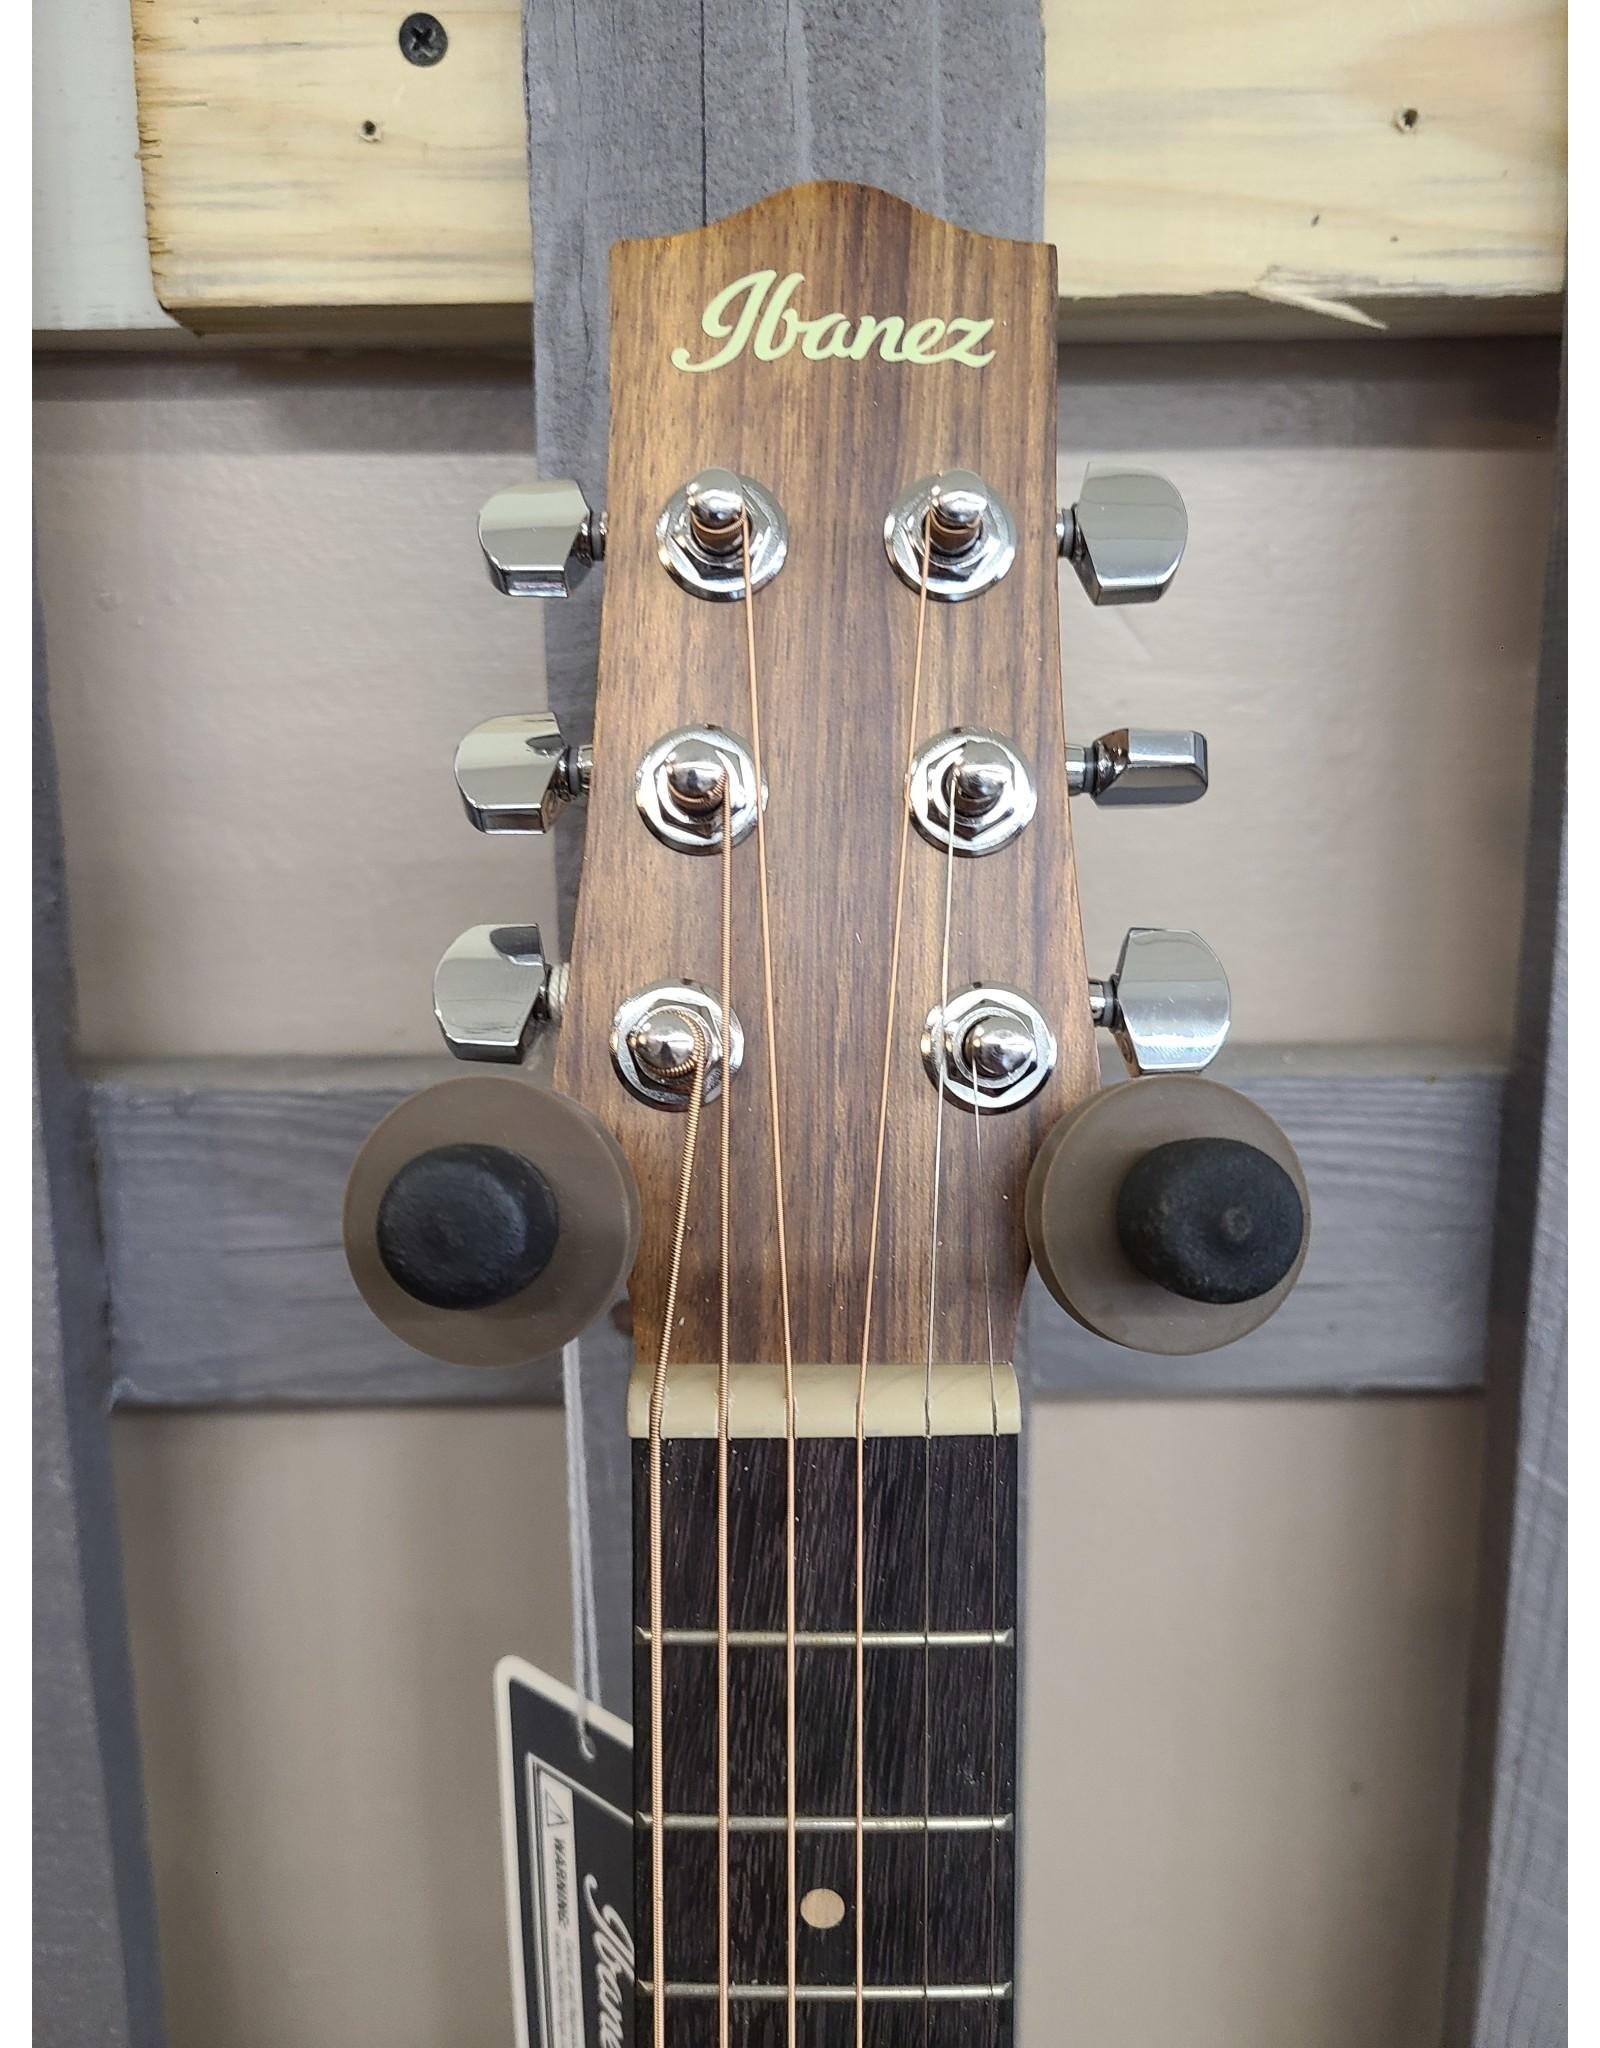 Ibanez Ibanez EWP14 Piccolo Guitar Open Pore Natural